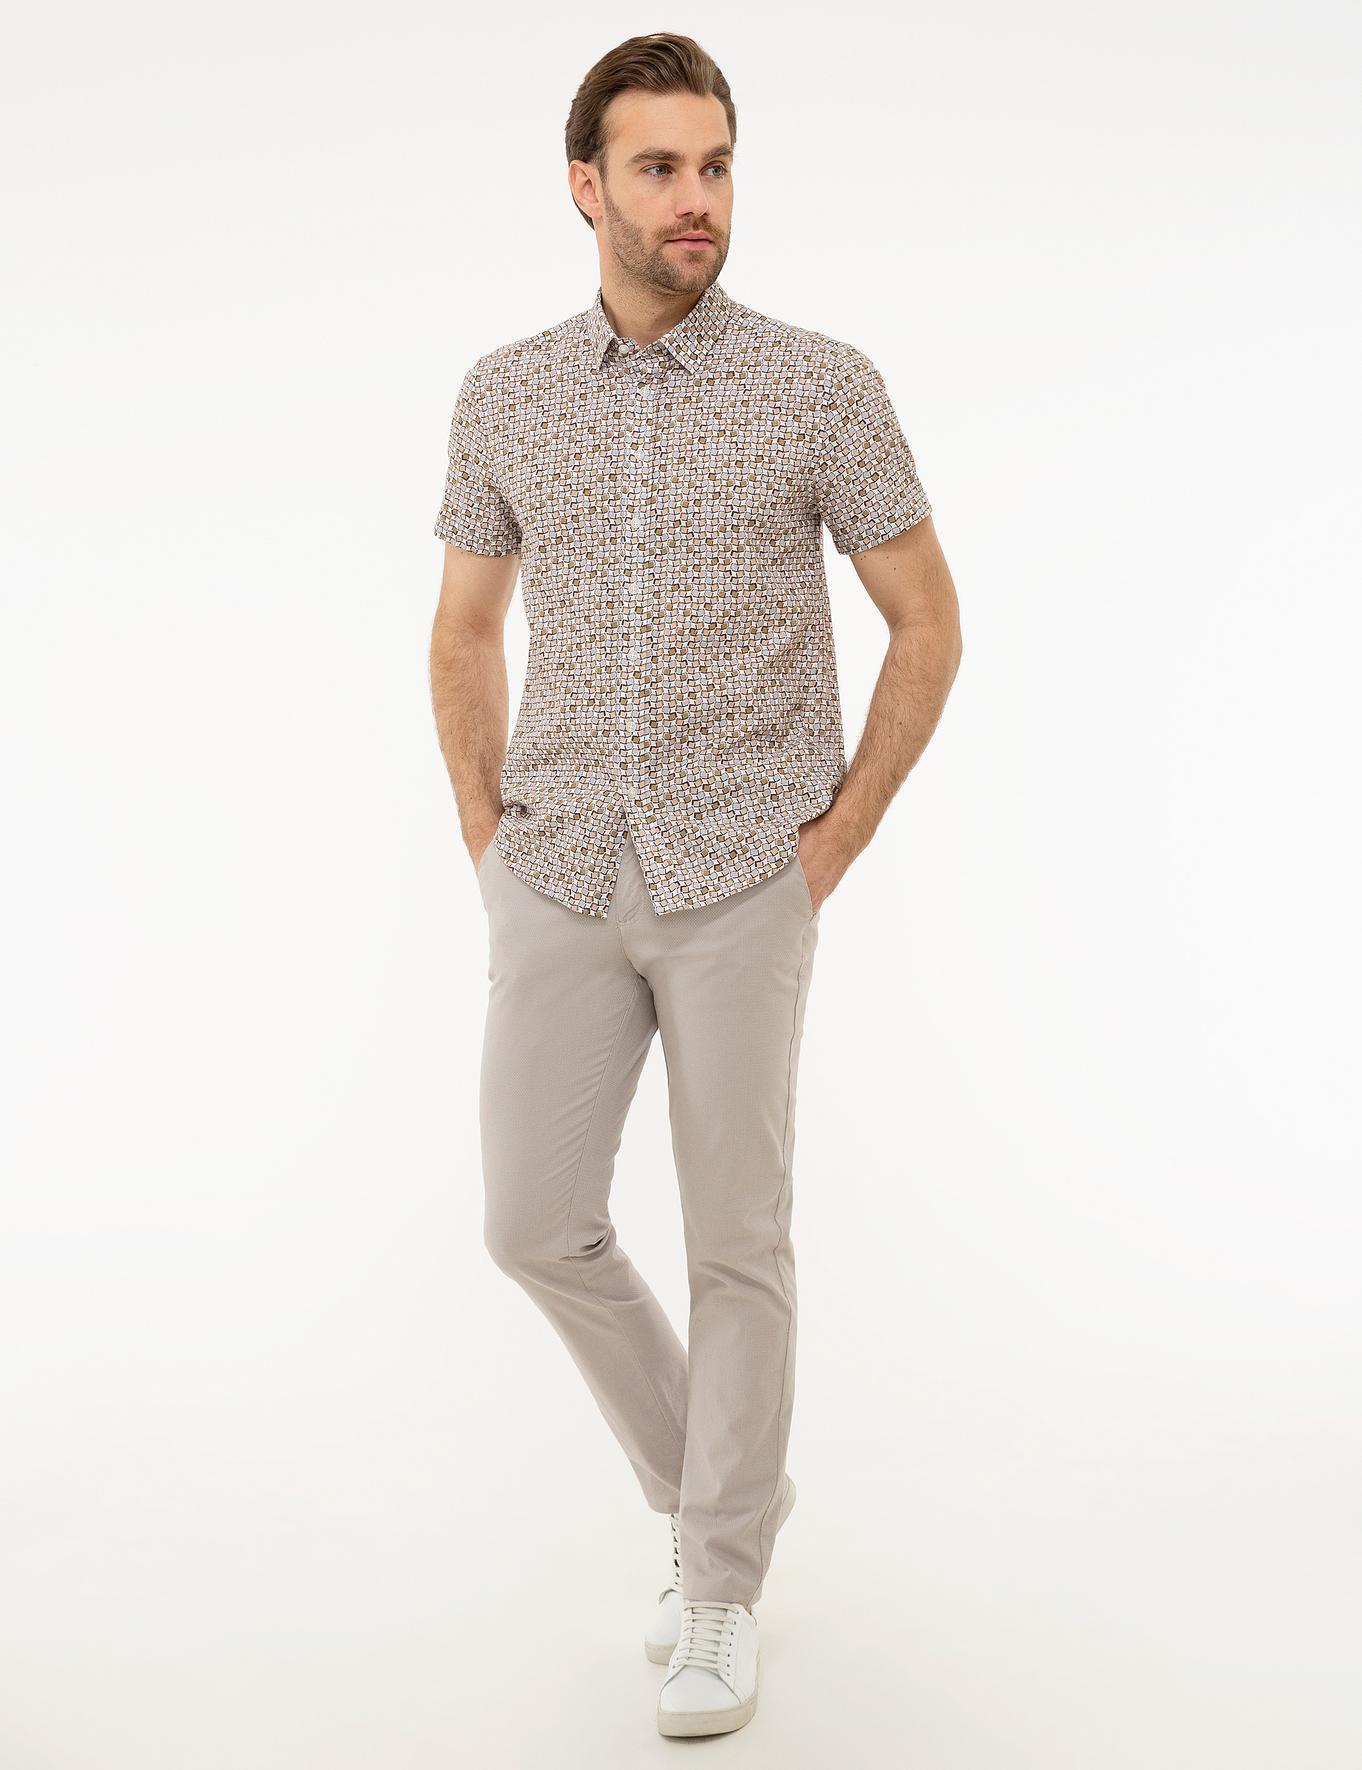 Haki Slim Fit Kısa Kollu Gömlek